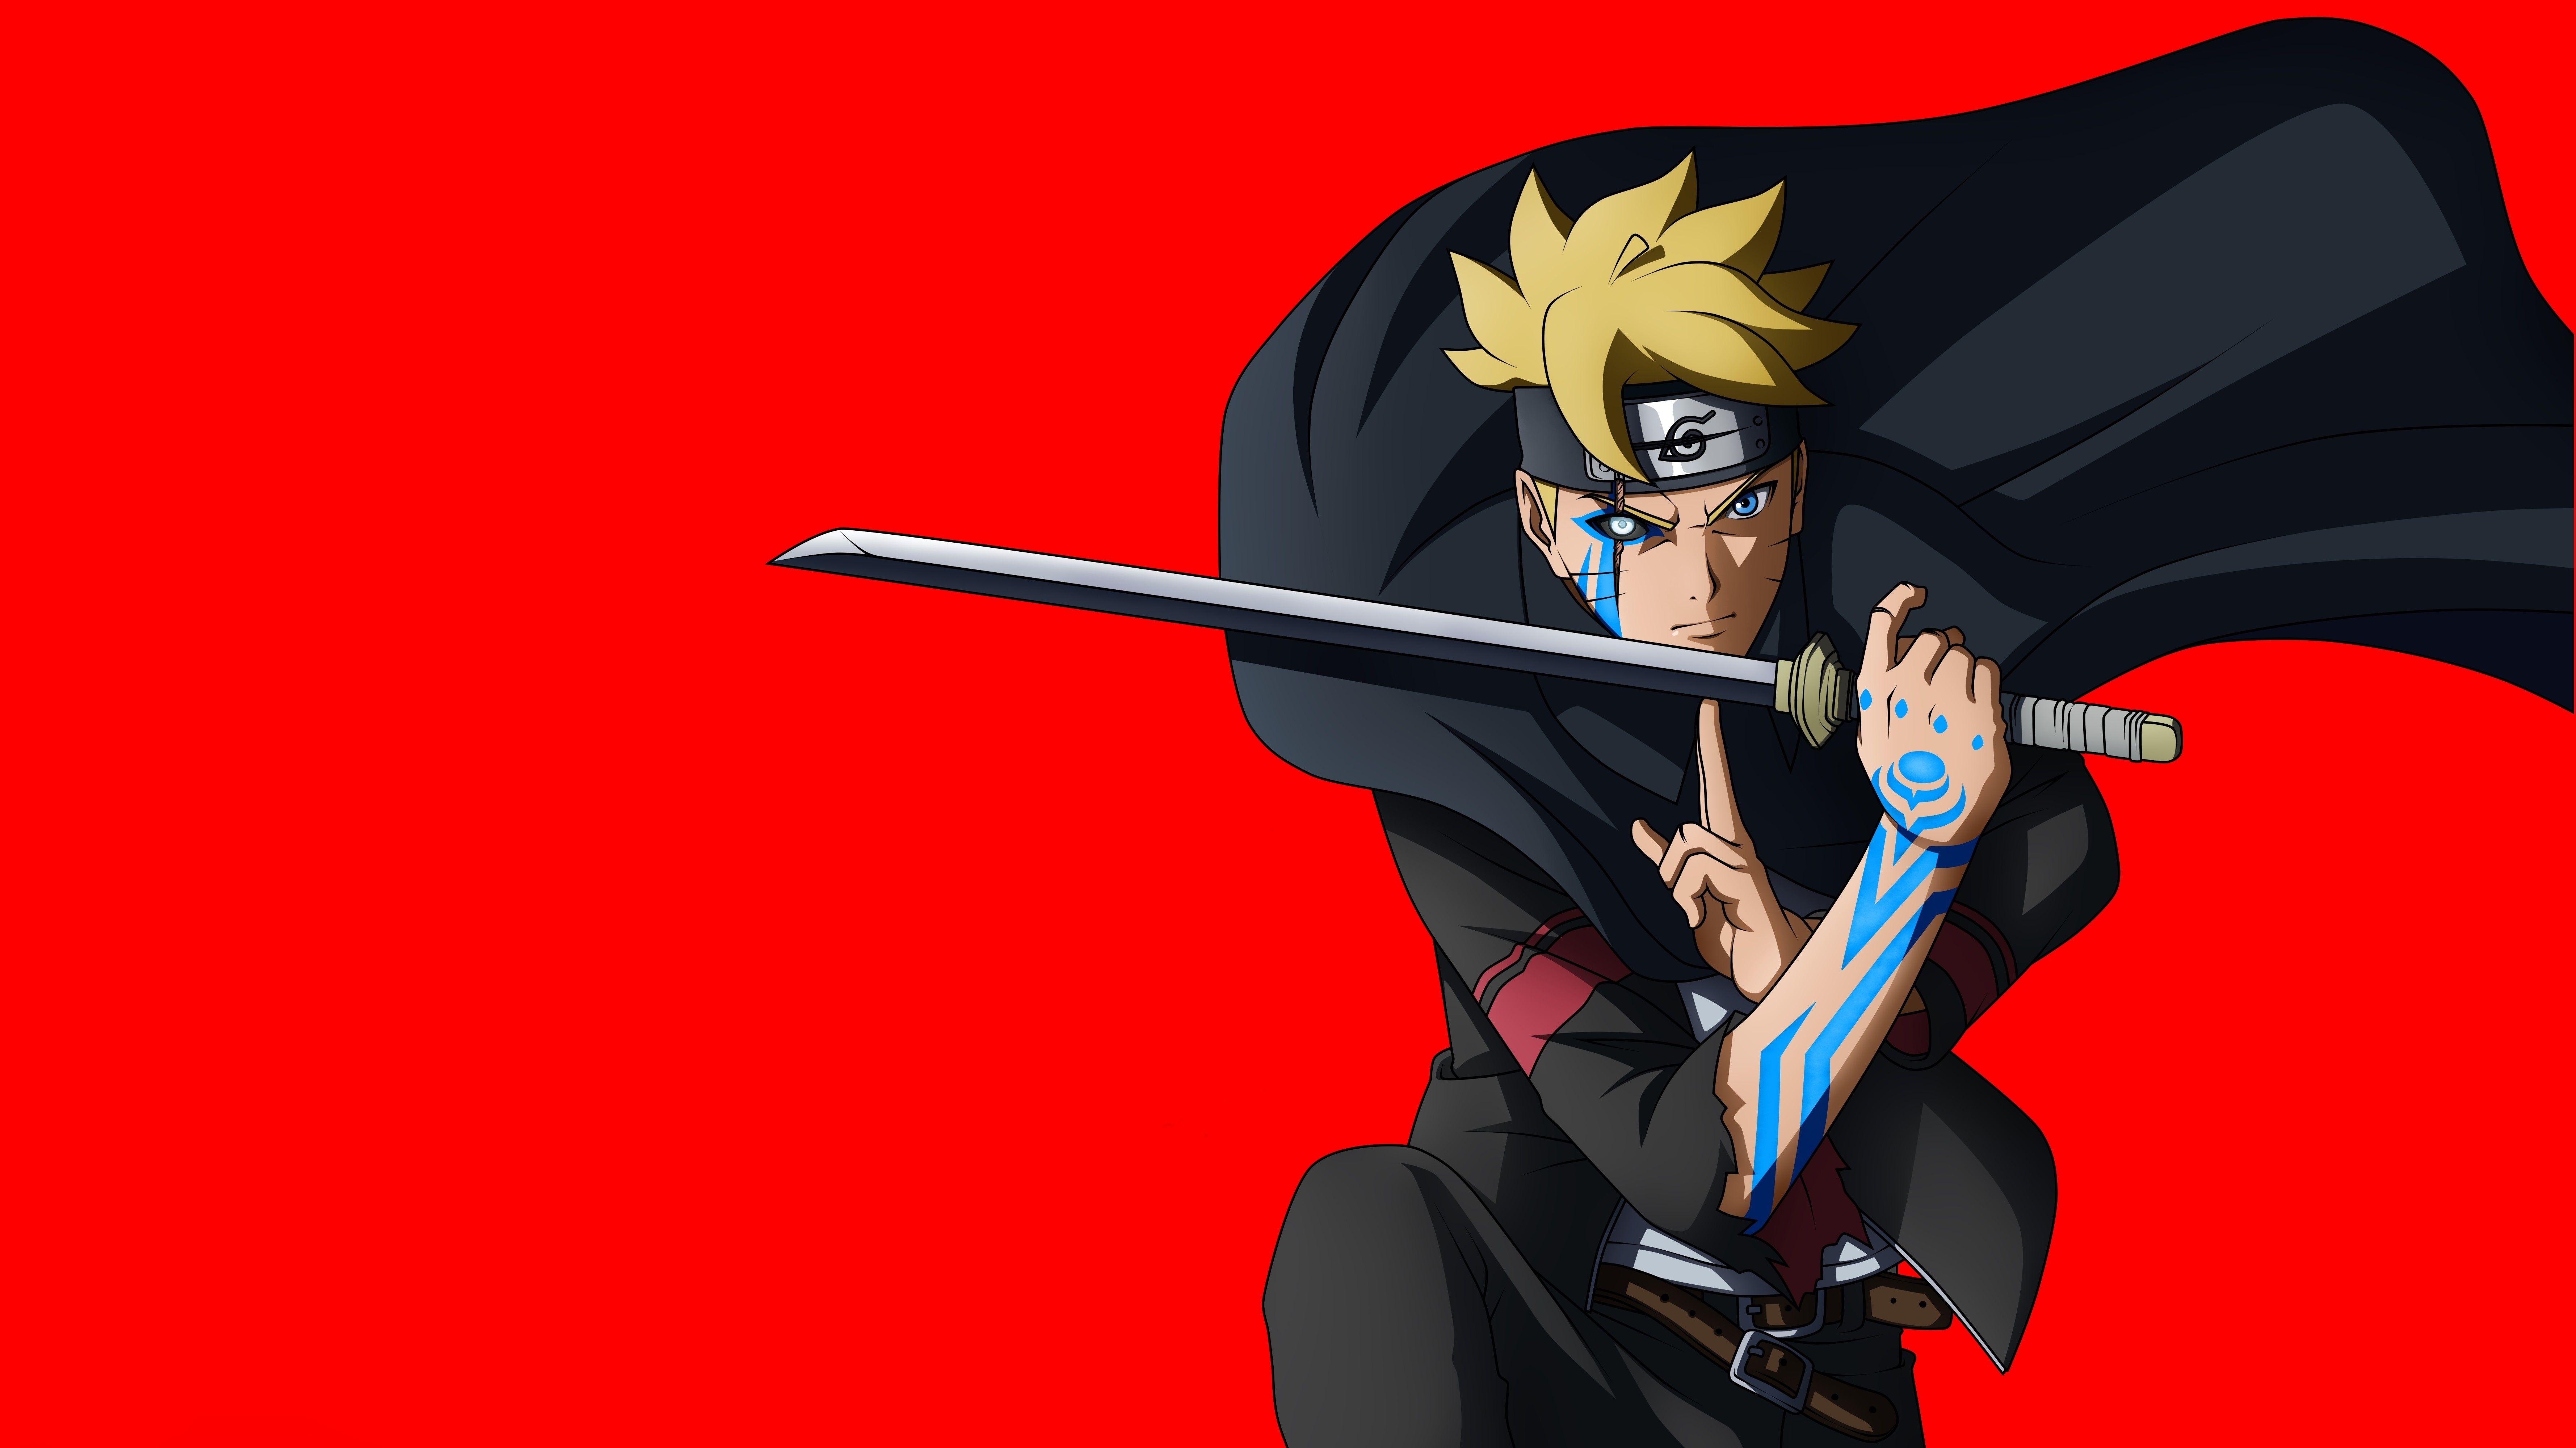 Gambar Naruto Untuk Wallpaper Di 2020 Gambar Naruto Animasi